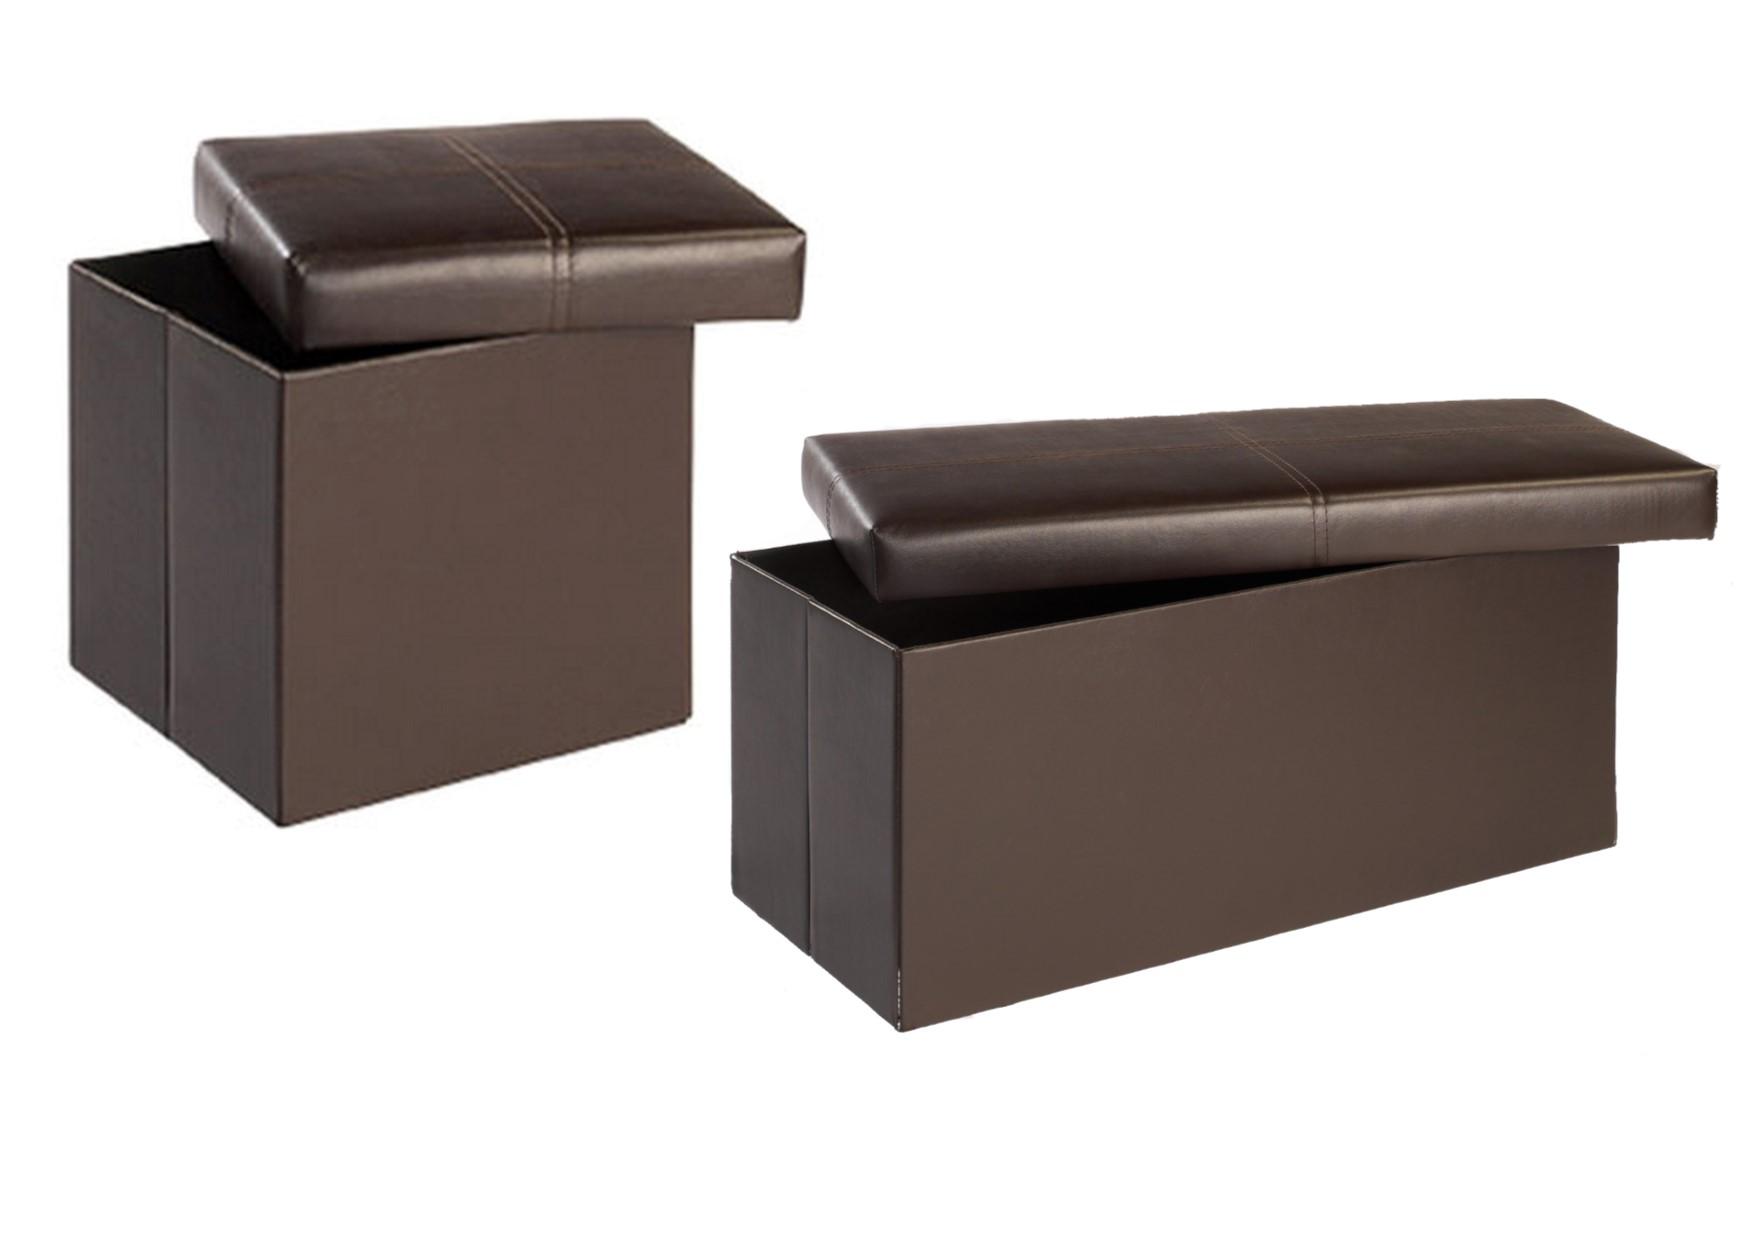 madrid ottoman storage stools boxes